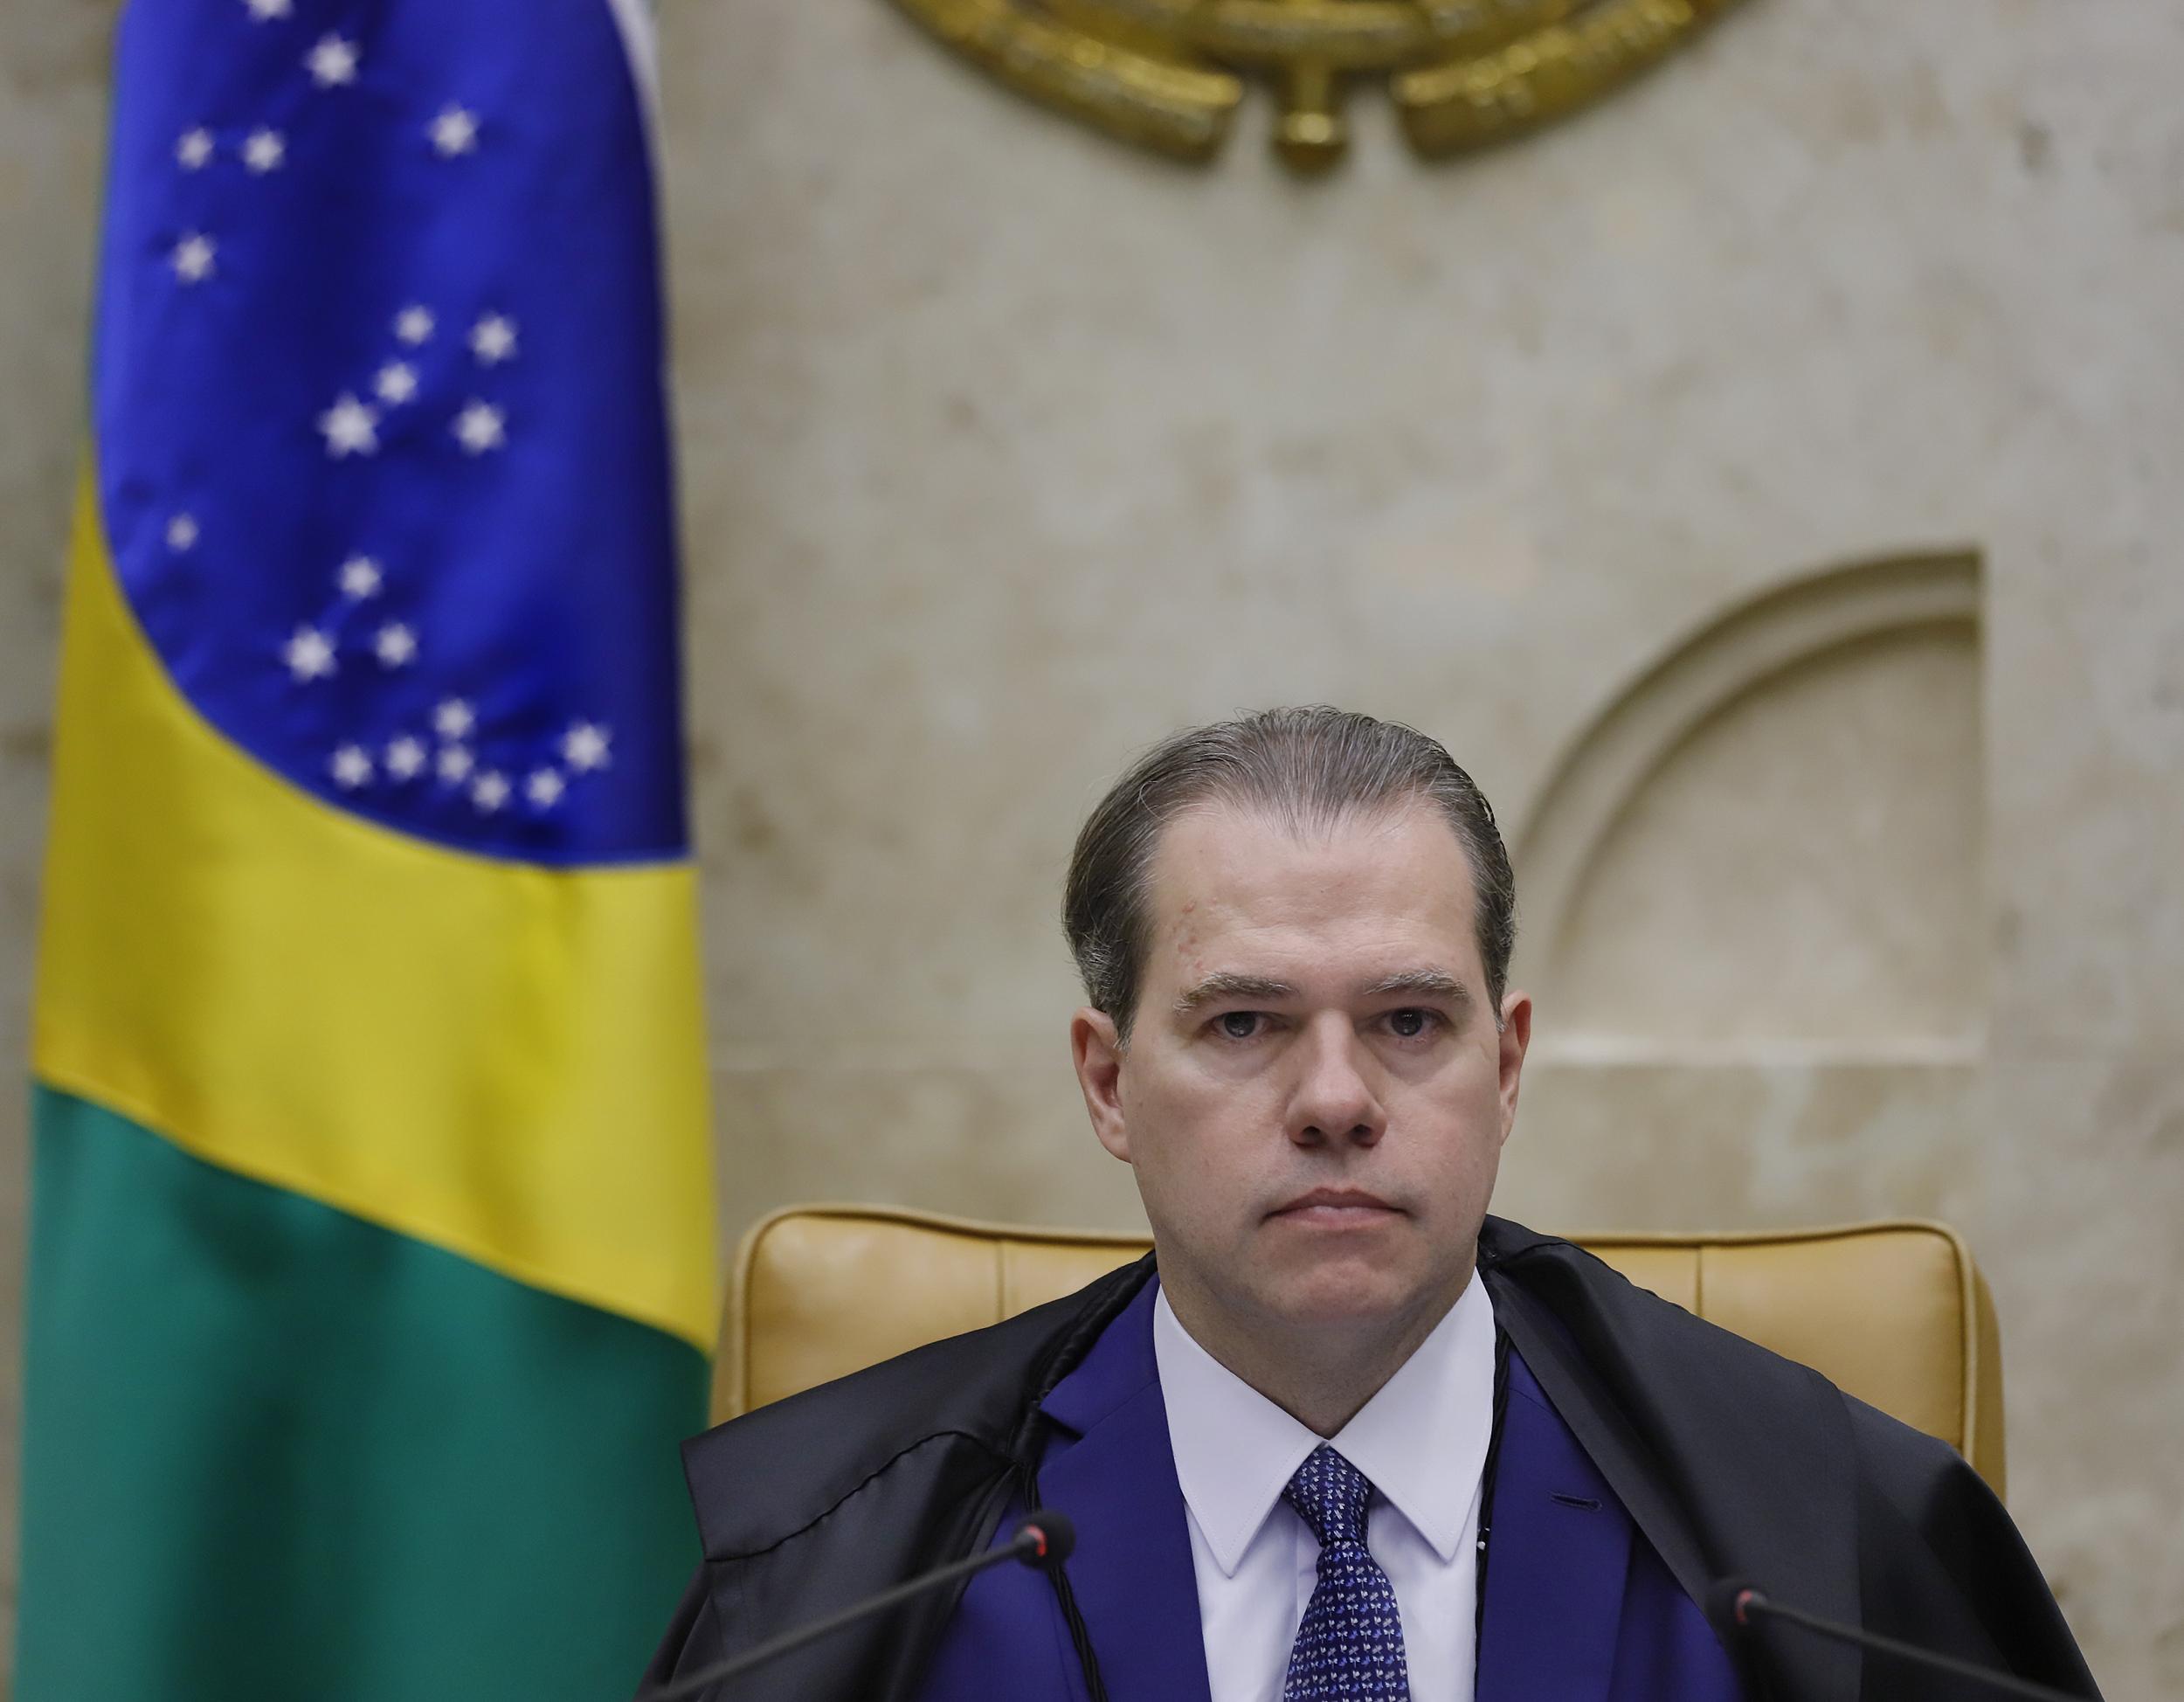 Toffoli defende que juiz só possa disputar eleições 8 anos após deixar magistratura